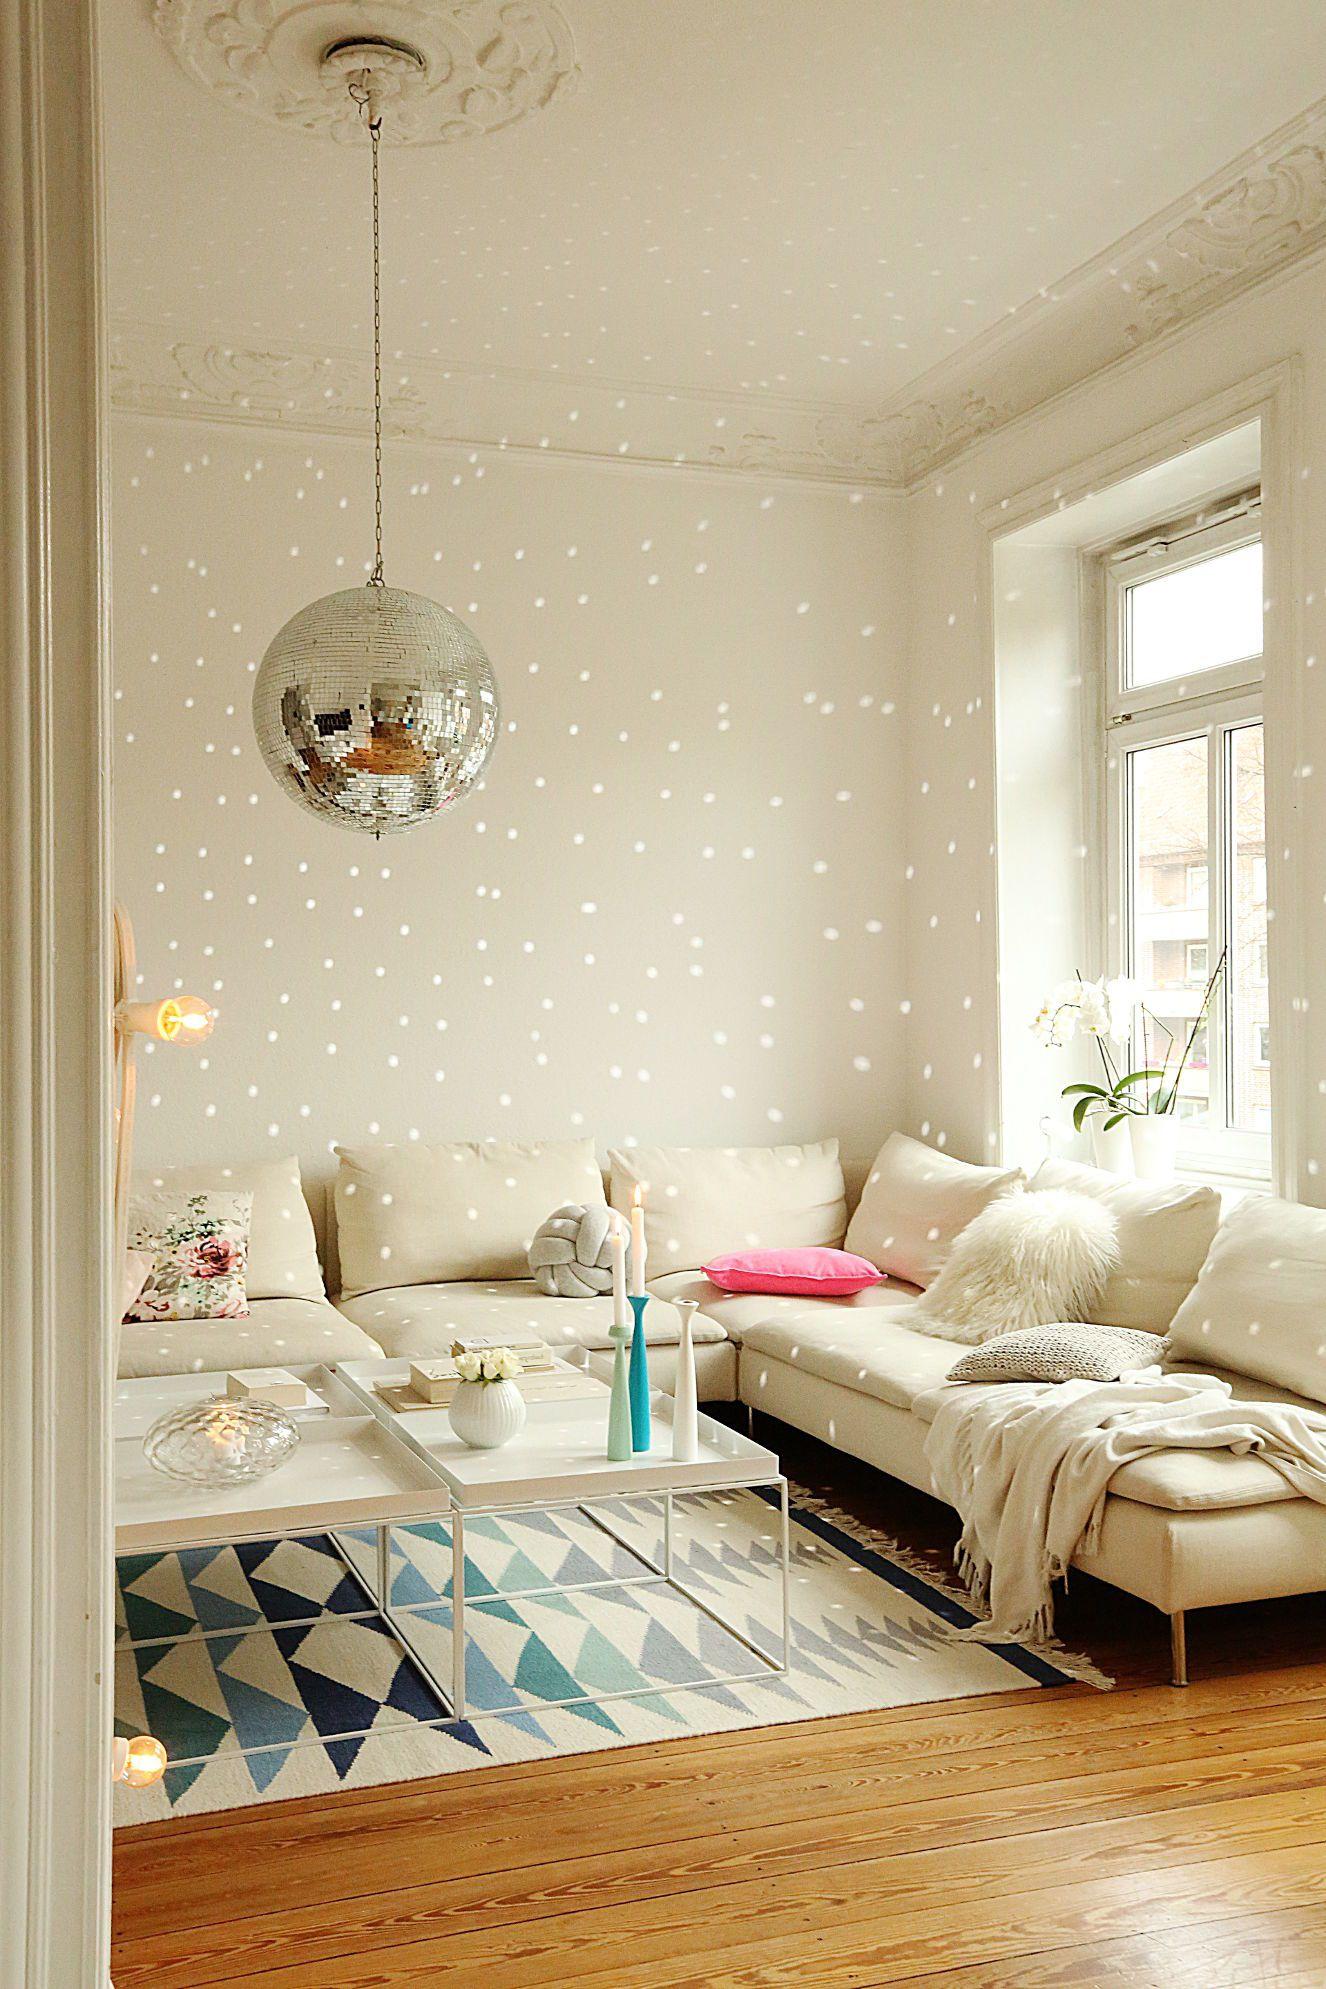 party deko ideen bilder. Black Bedroom Furniture Sets. Home Design Ideas